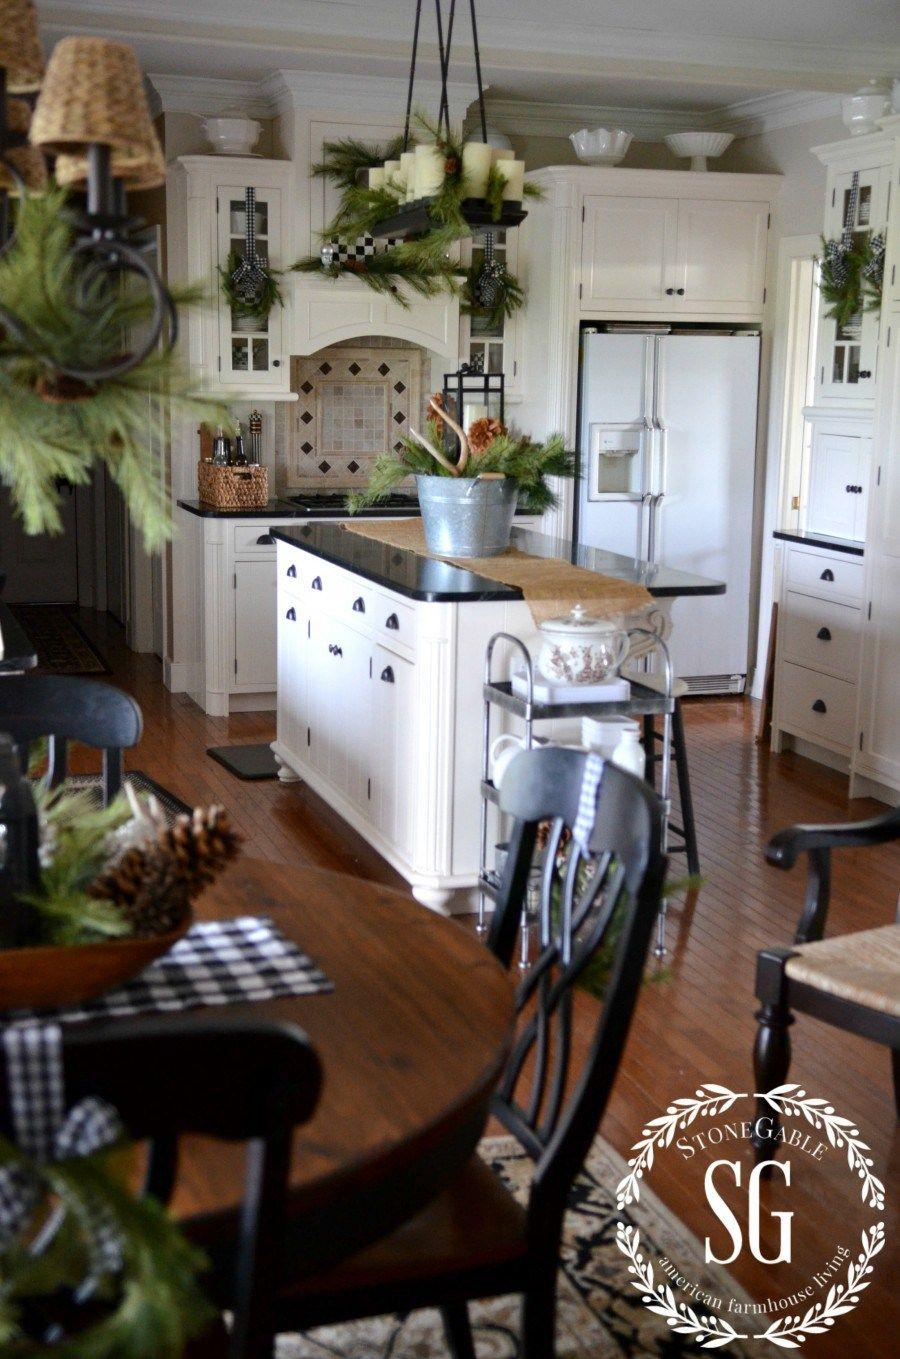 Pin de Carmalice Brushett en Cottage | Pinterest | Cocinas, Casa de ...